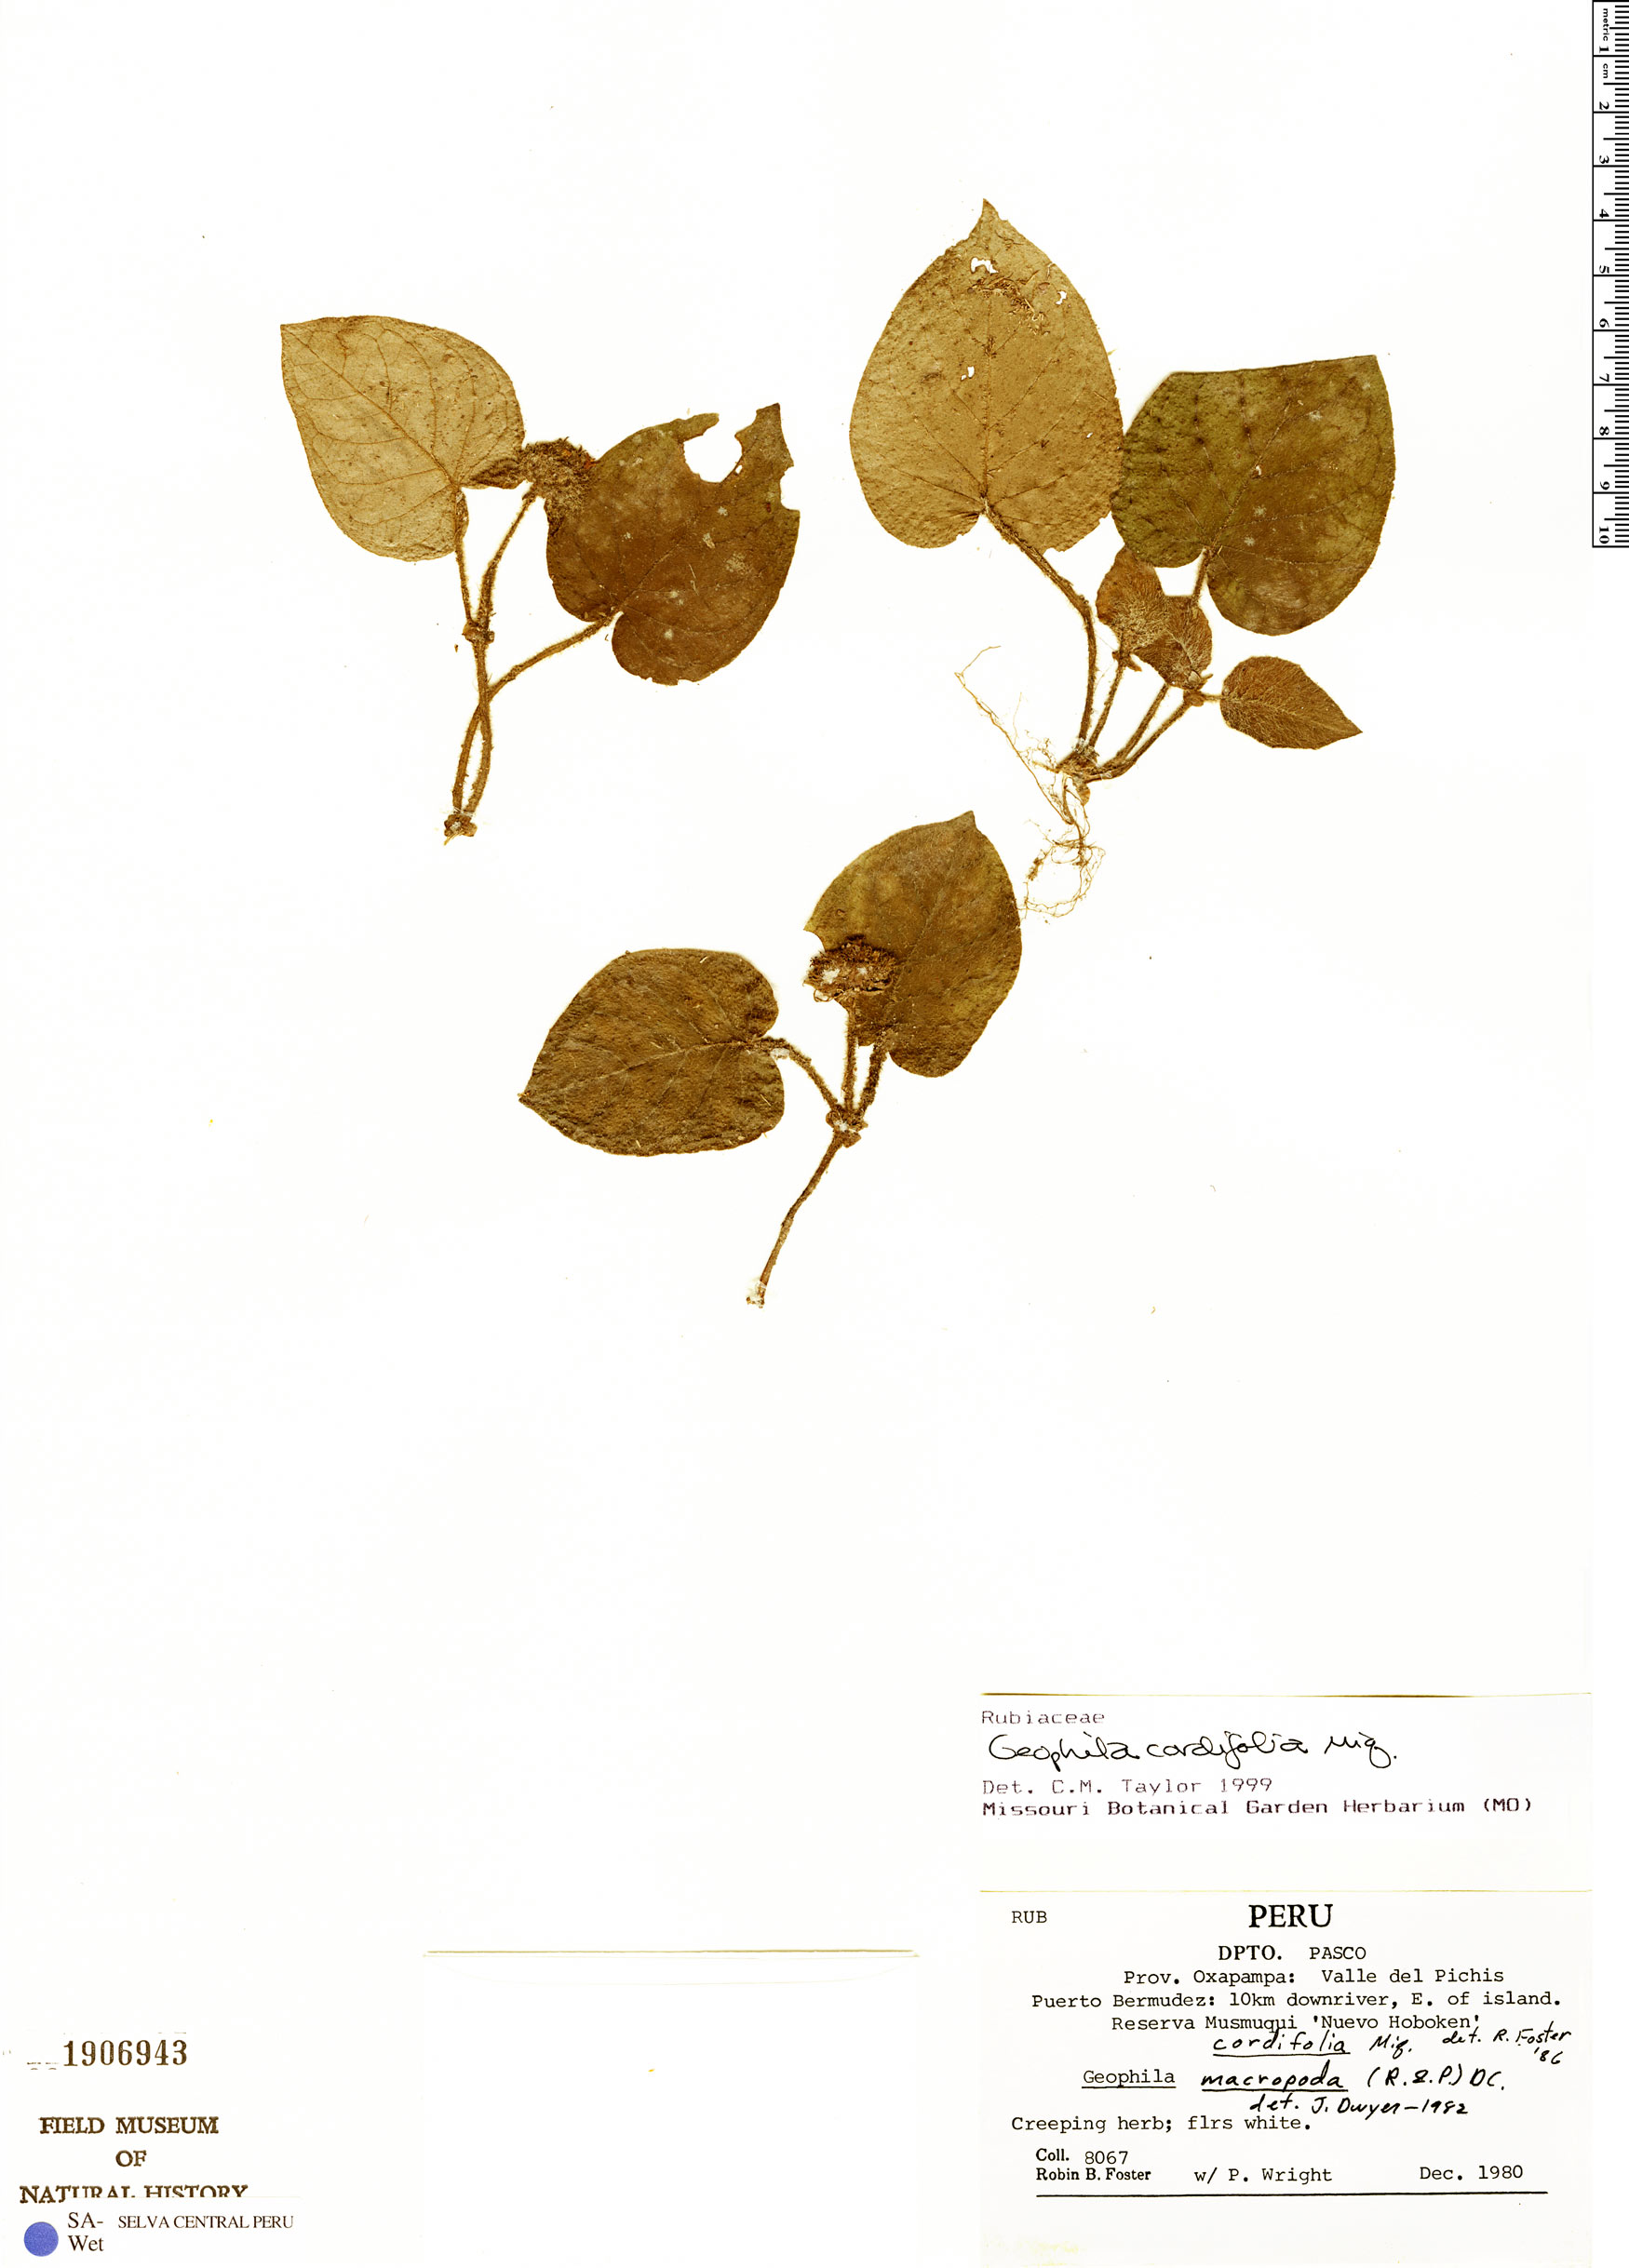 Specimen: Geophila cordifolia